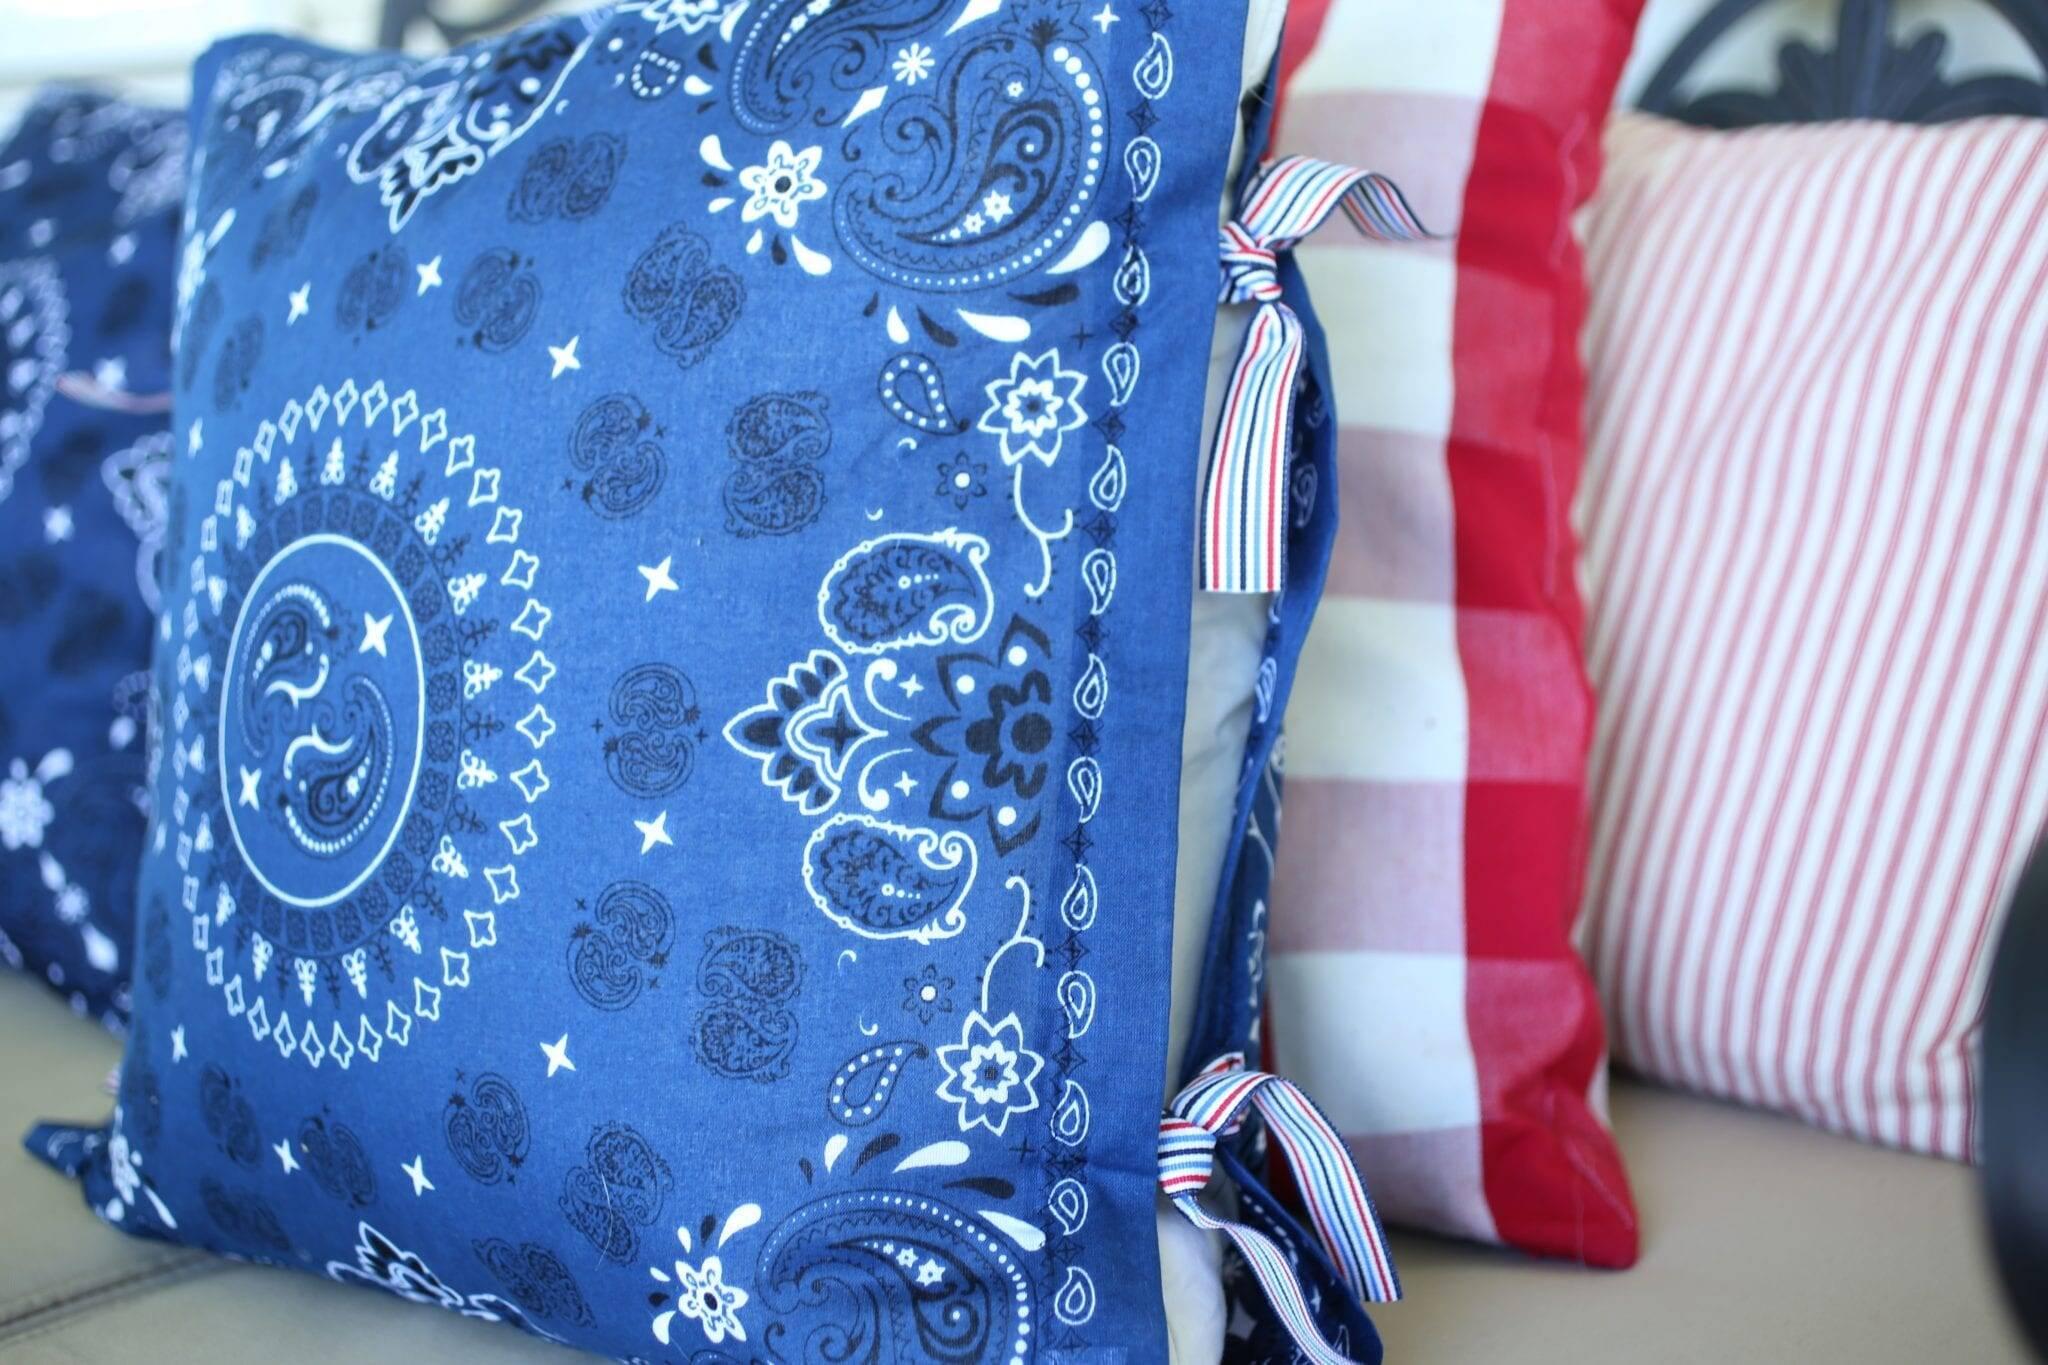 patriotic outdoor bandana pillows